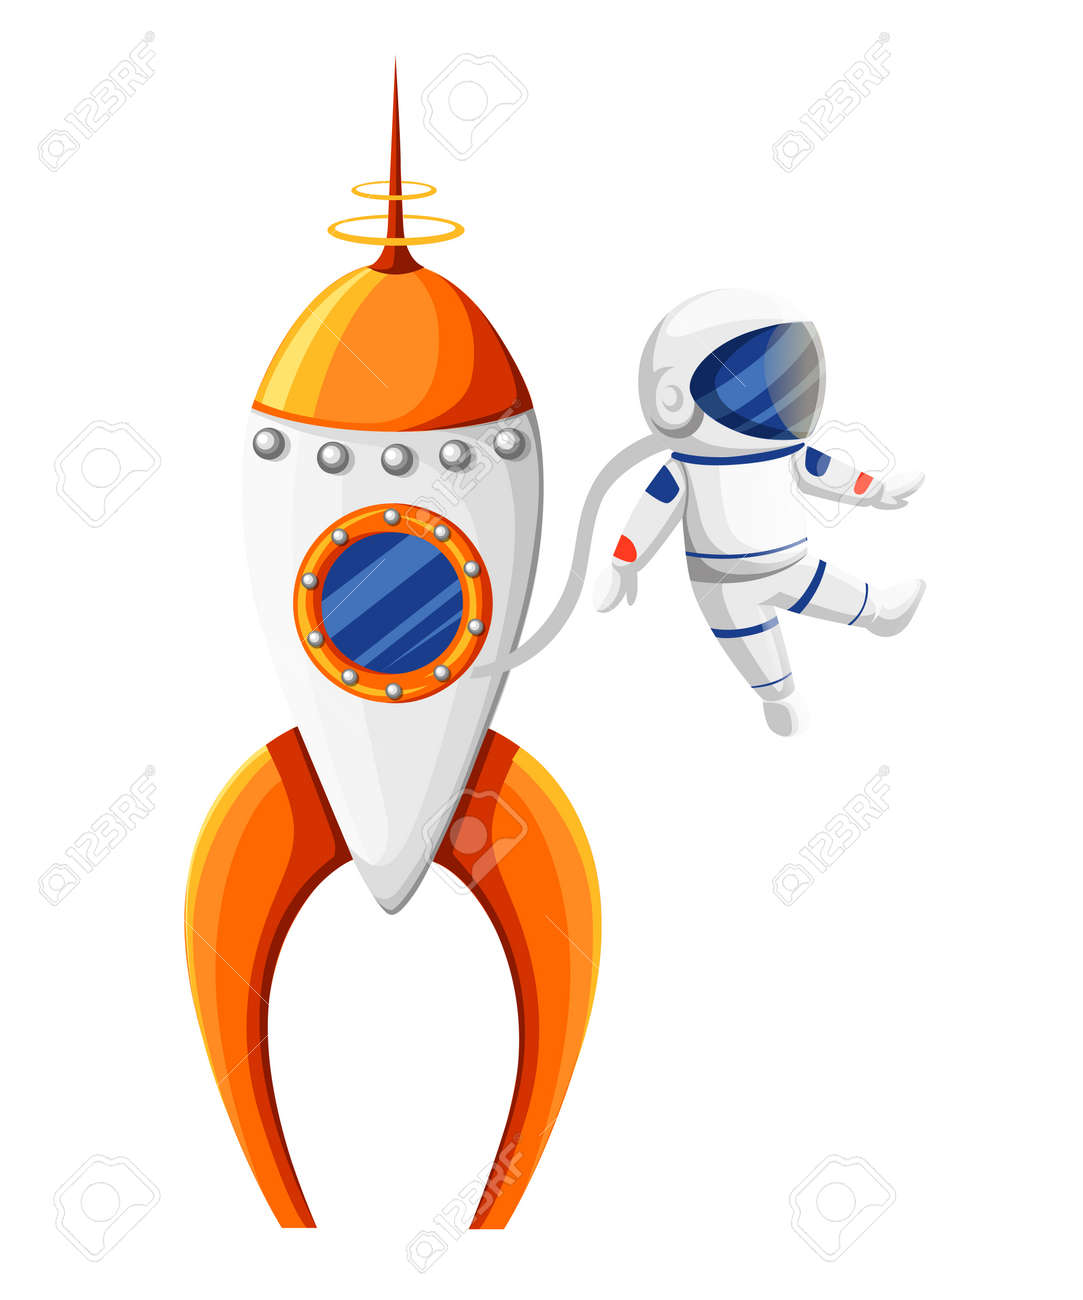 cartoon astronaut with spacesuit near rocket in zero gravity rh 123rf com spaceship vector worksheet spaceship vector images